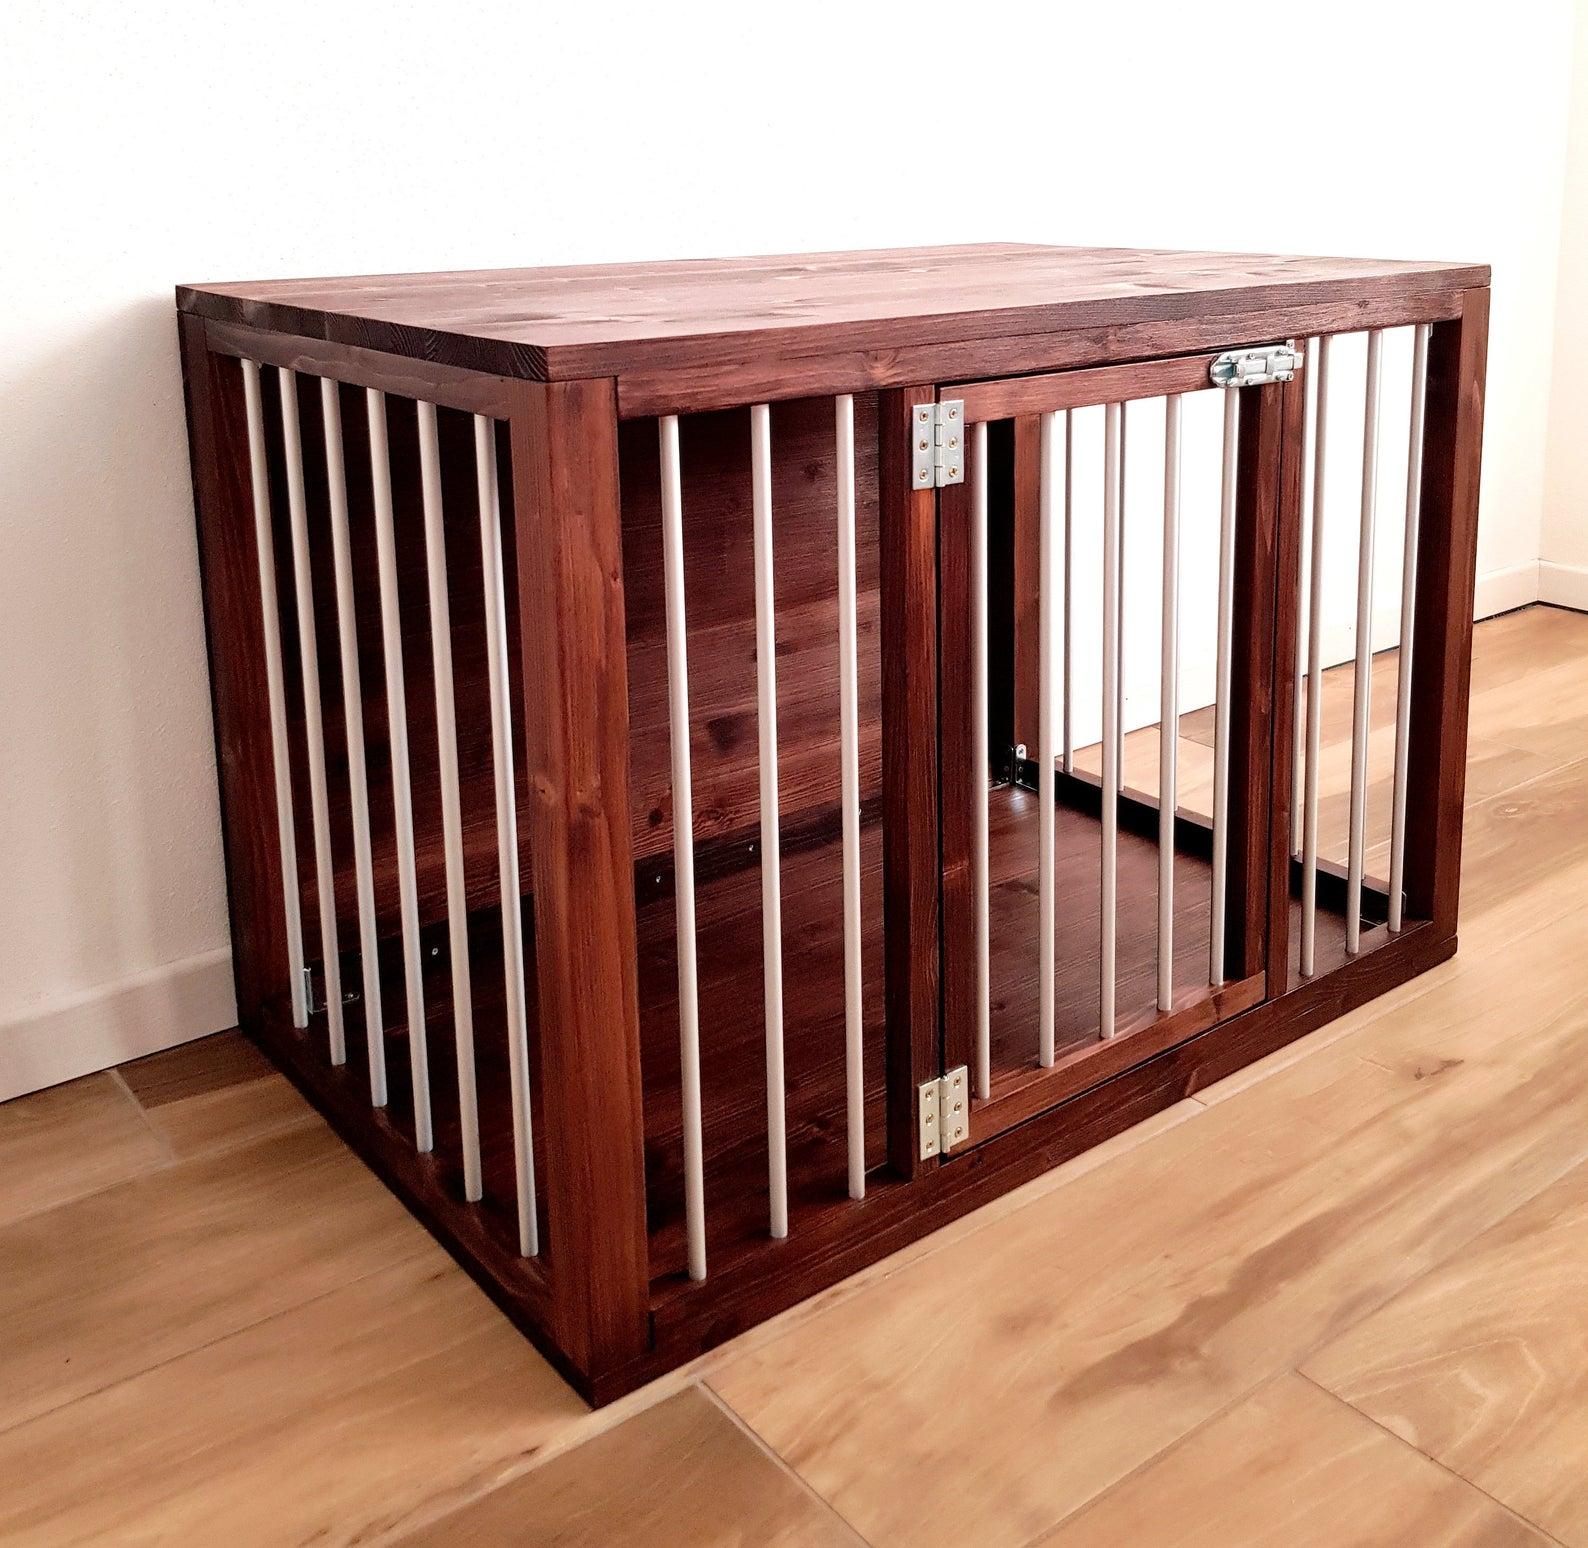 Modern Wood and Aluminium Dog House Crate via Pink Bau (Etsy)